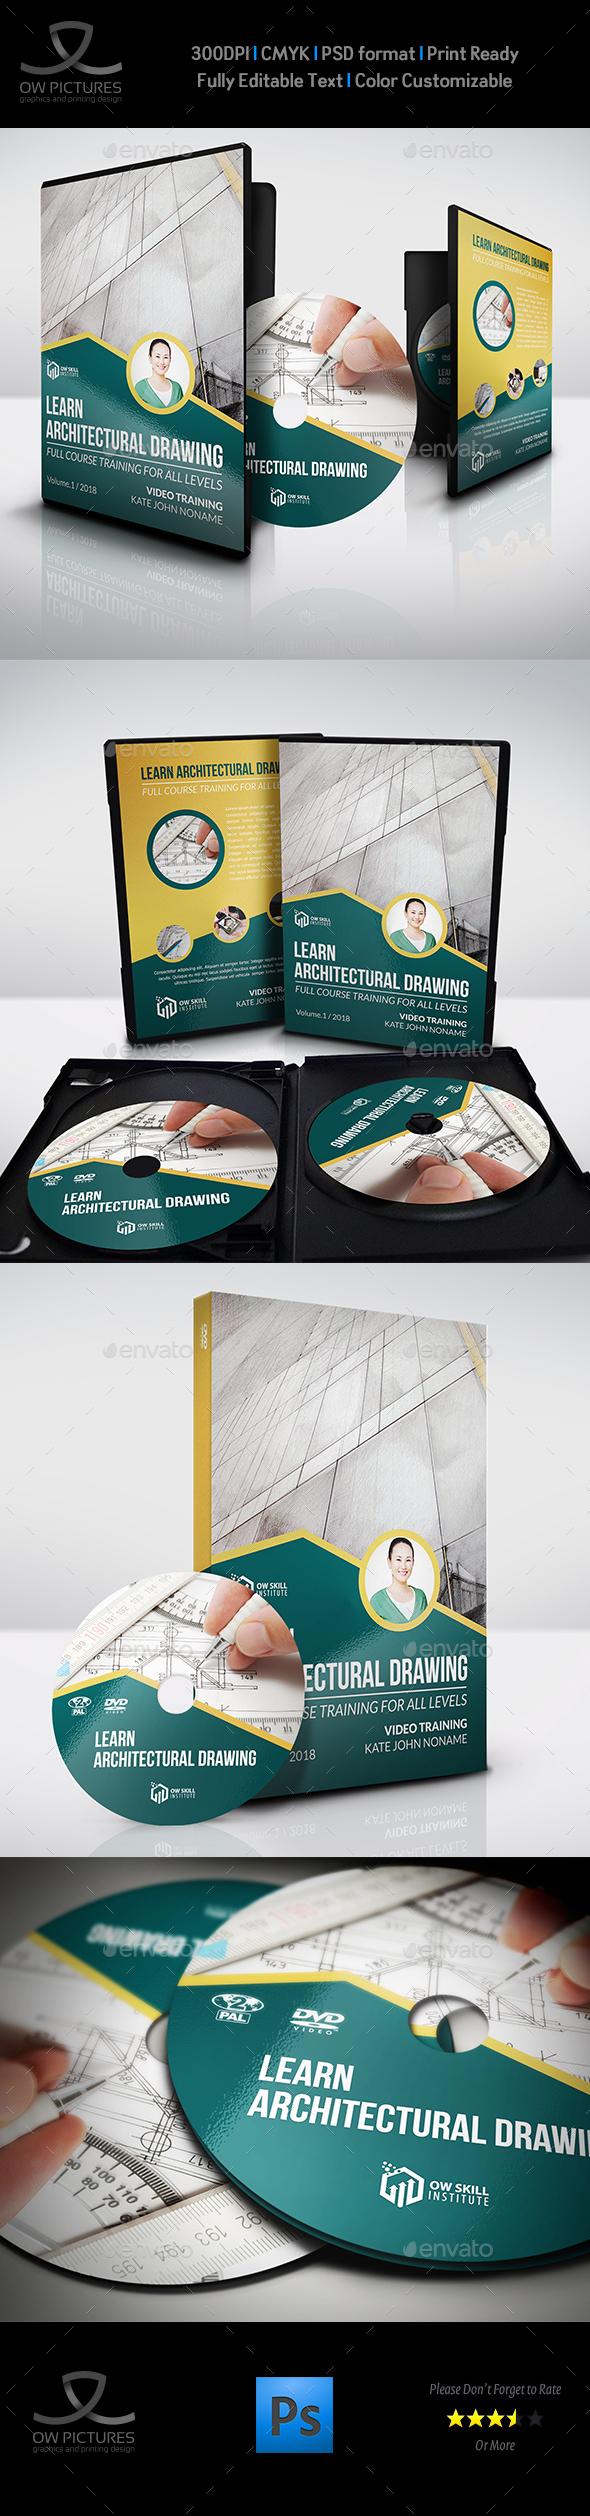 Training Course DVD Template Vol.2 - CD & DVD Artwork Print Templates